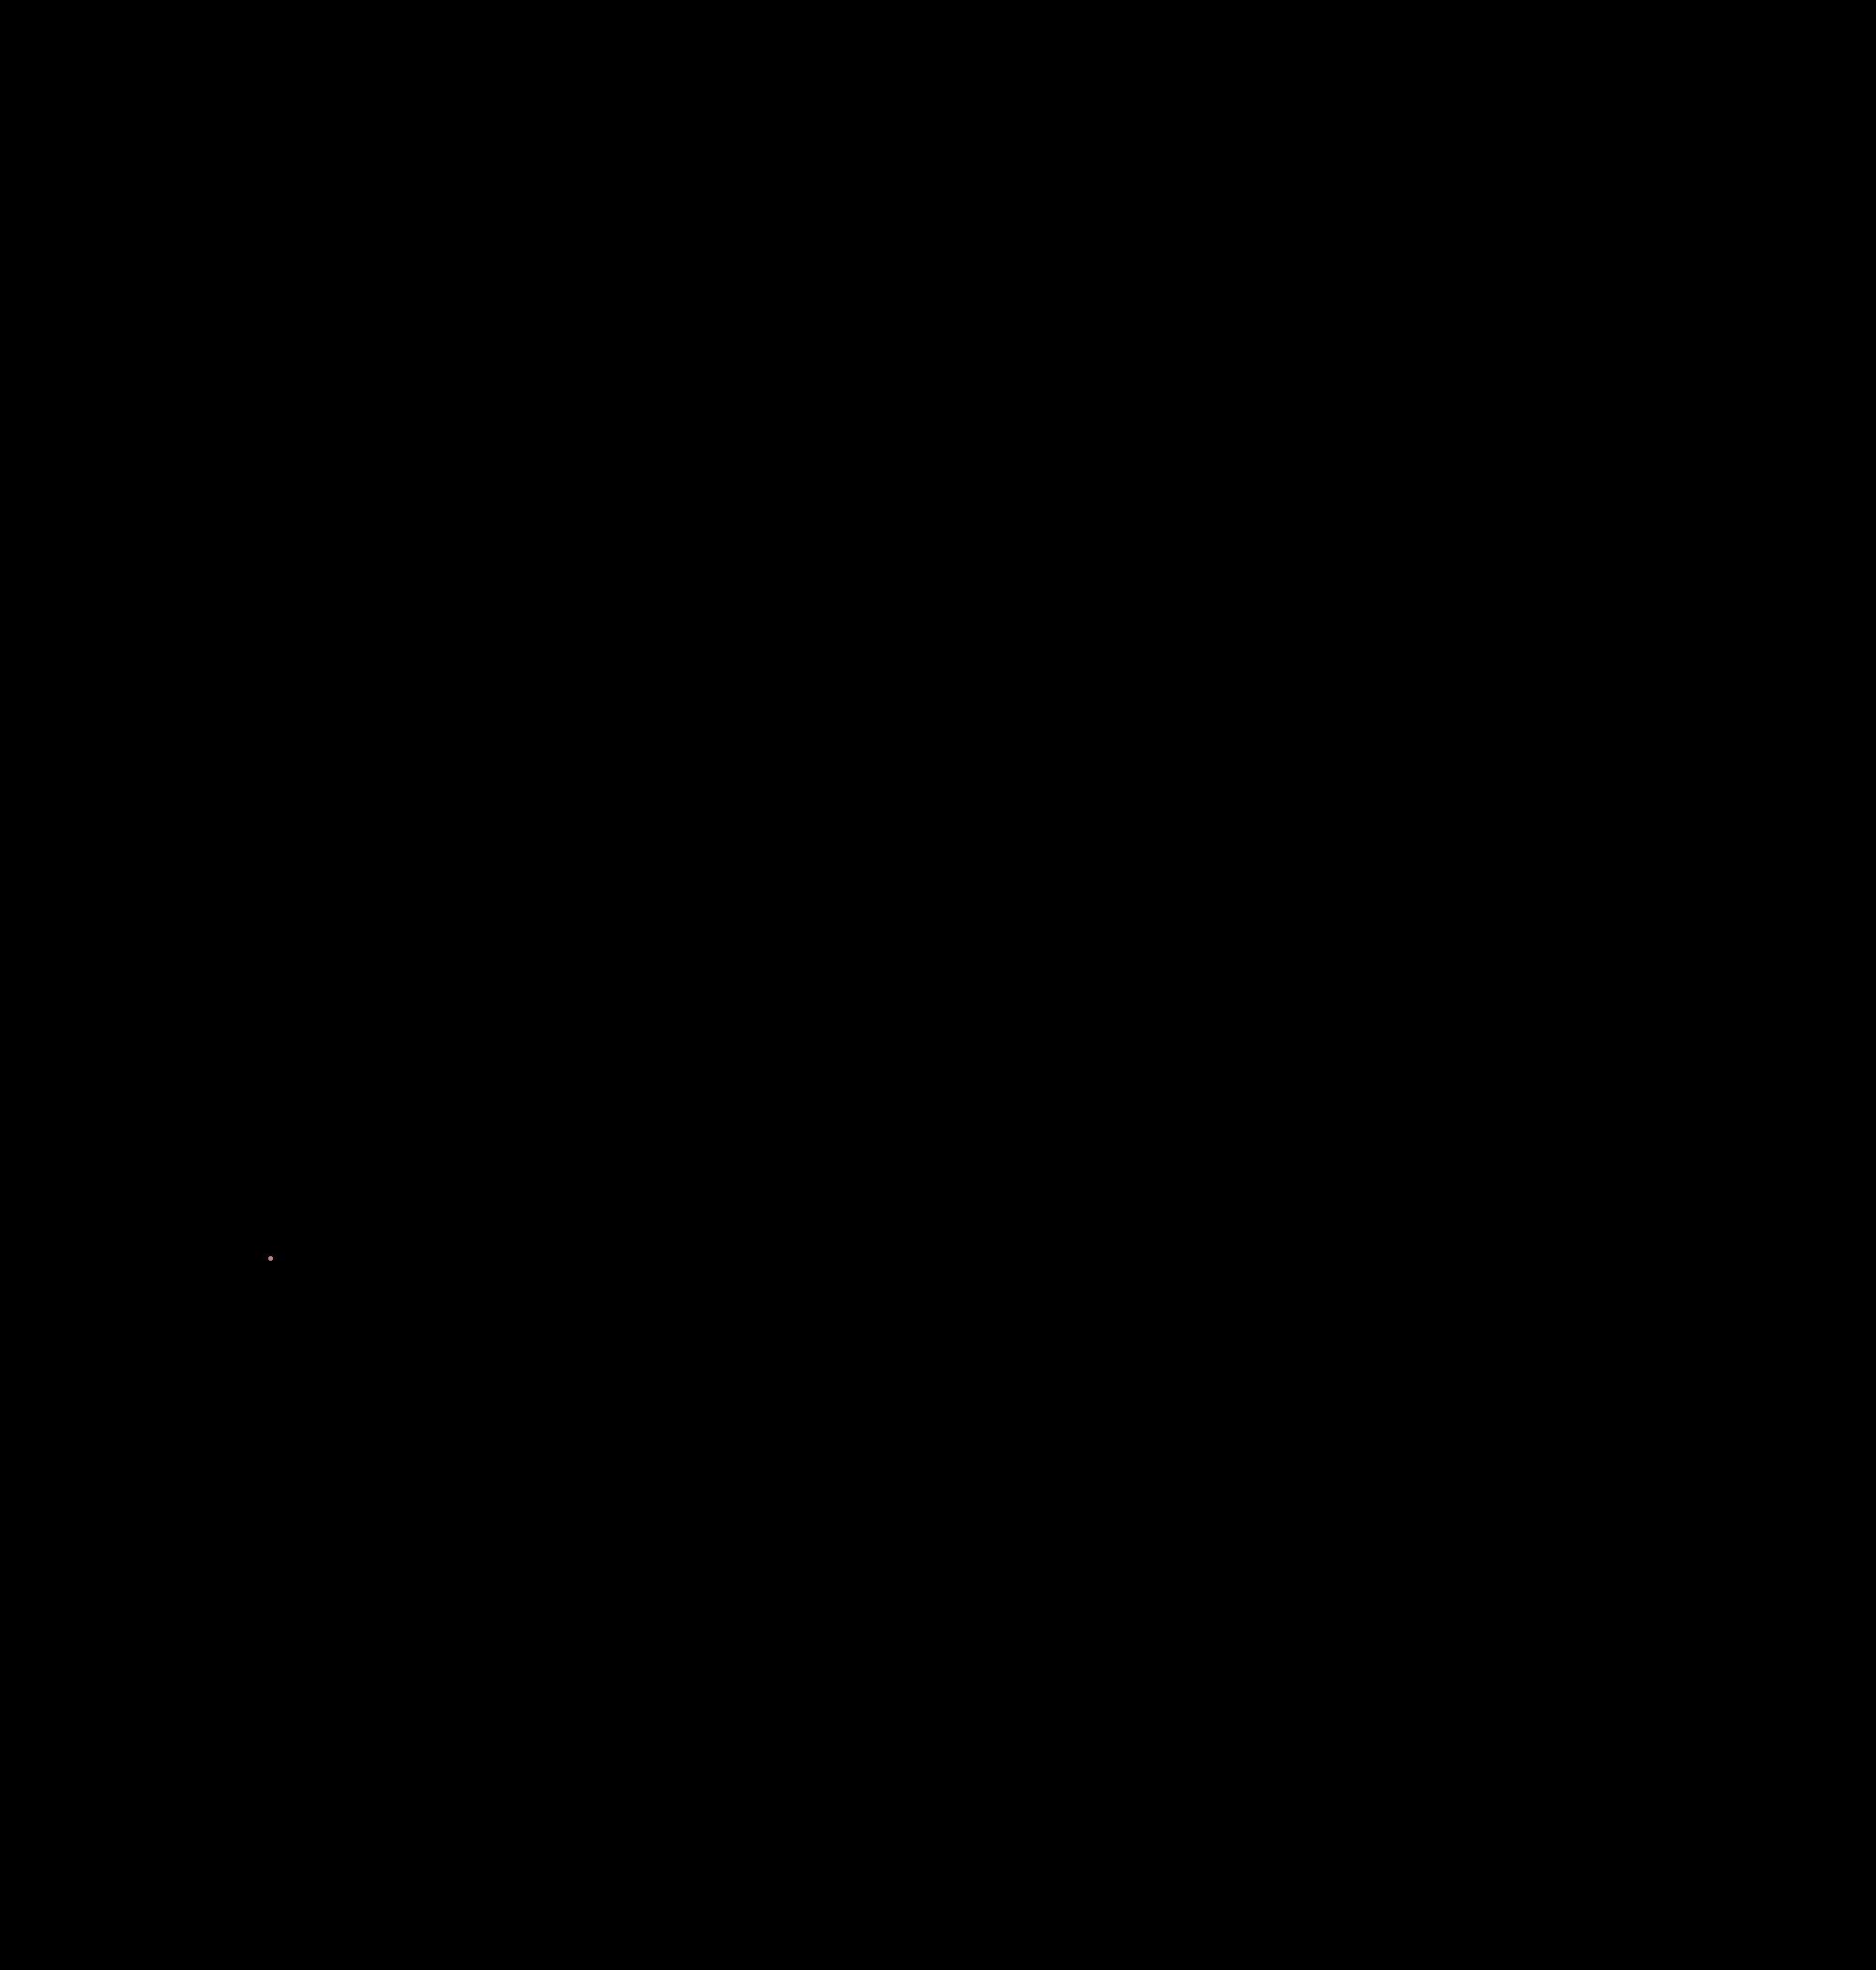 Fairy Tail Movie natsuXlucy lineart by Takyya.deviantart